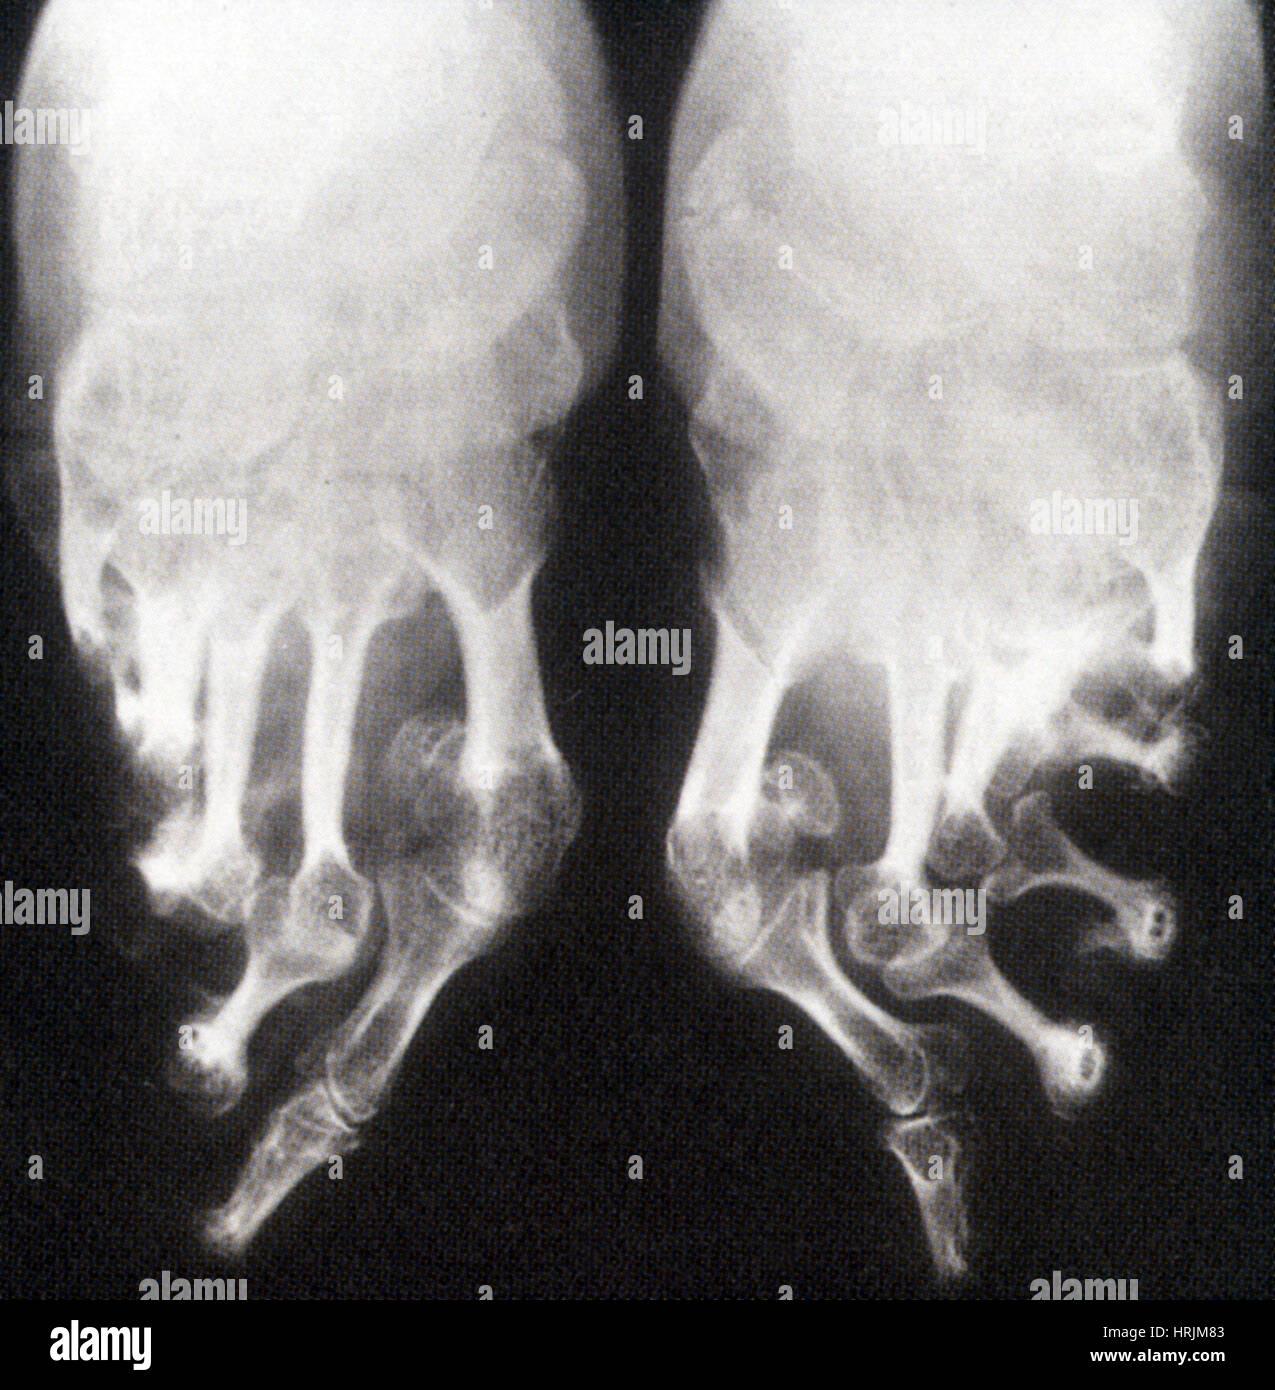 Bound Feet X Ray Stock Image